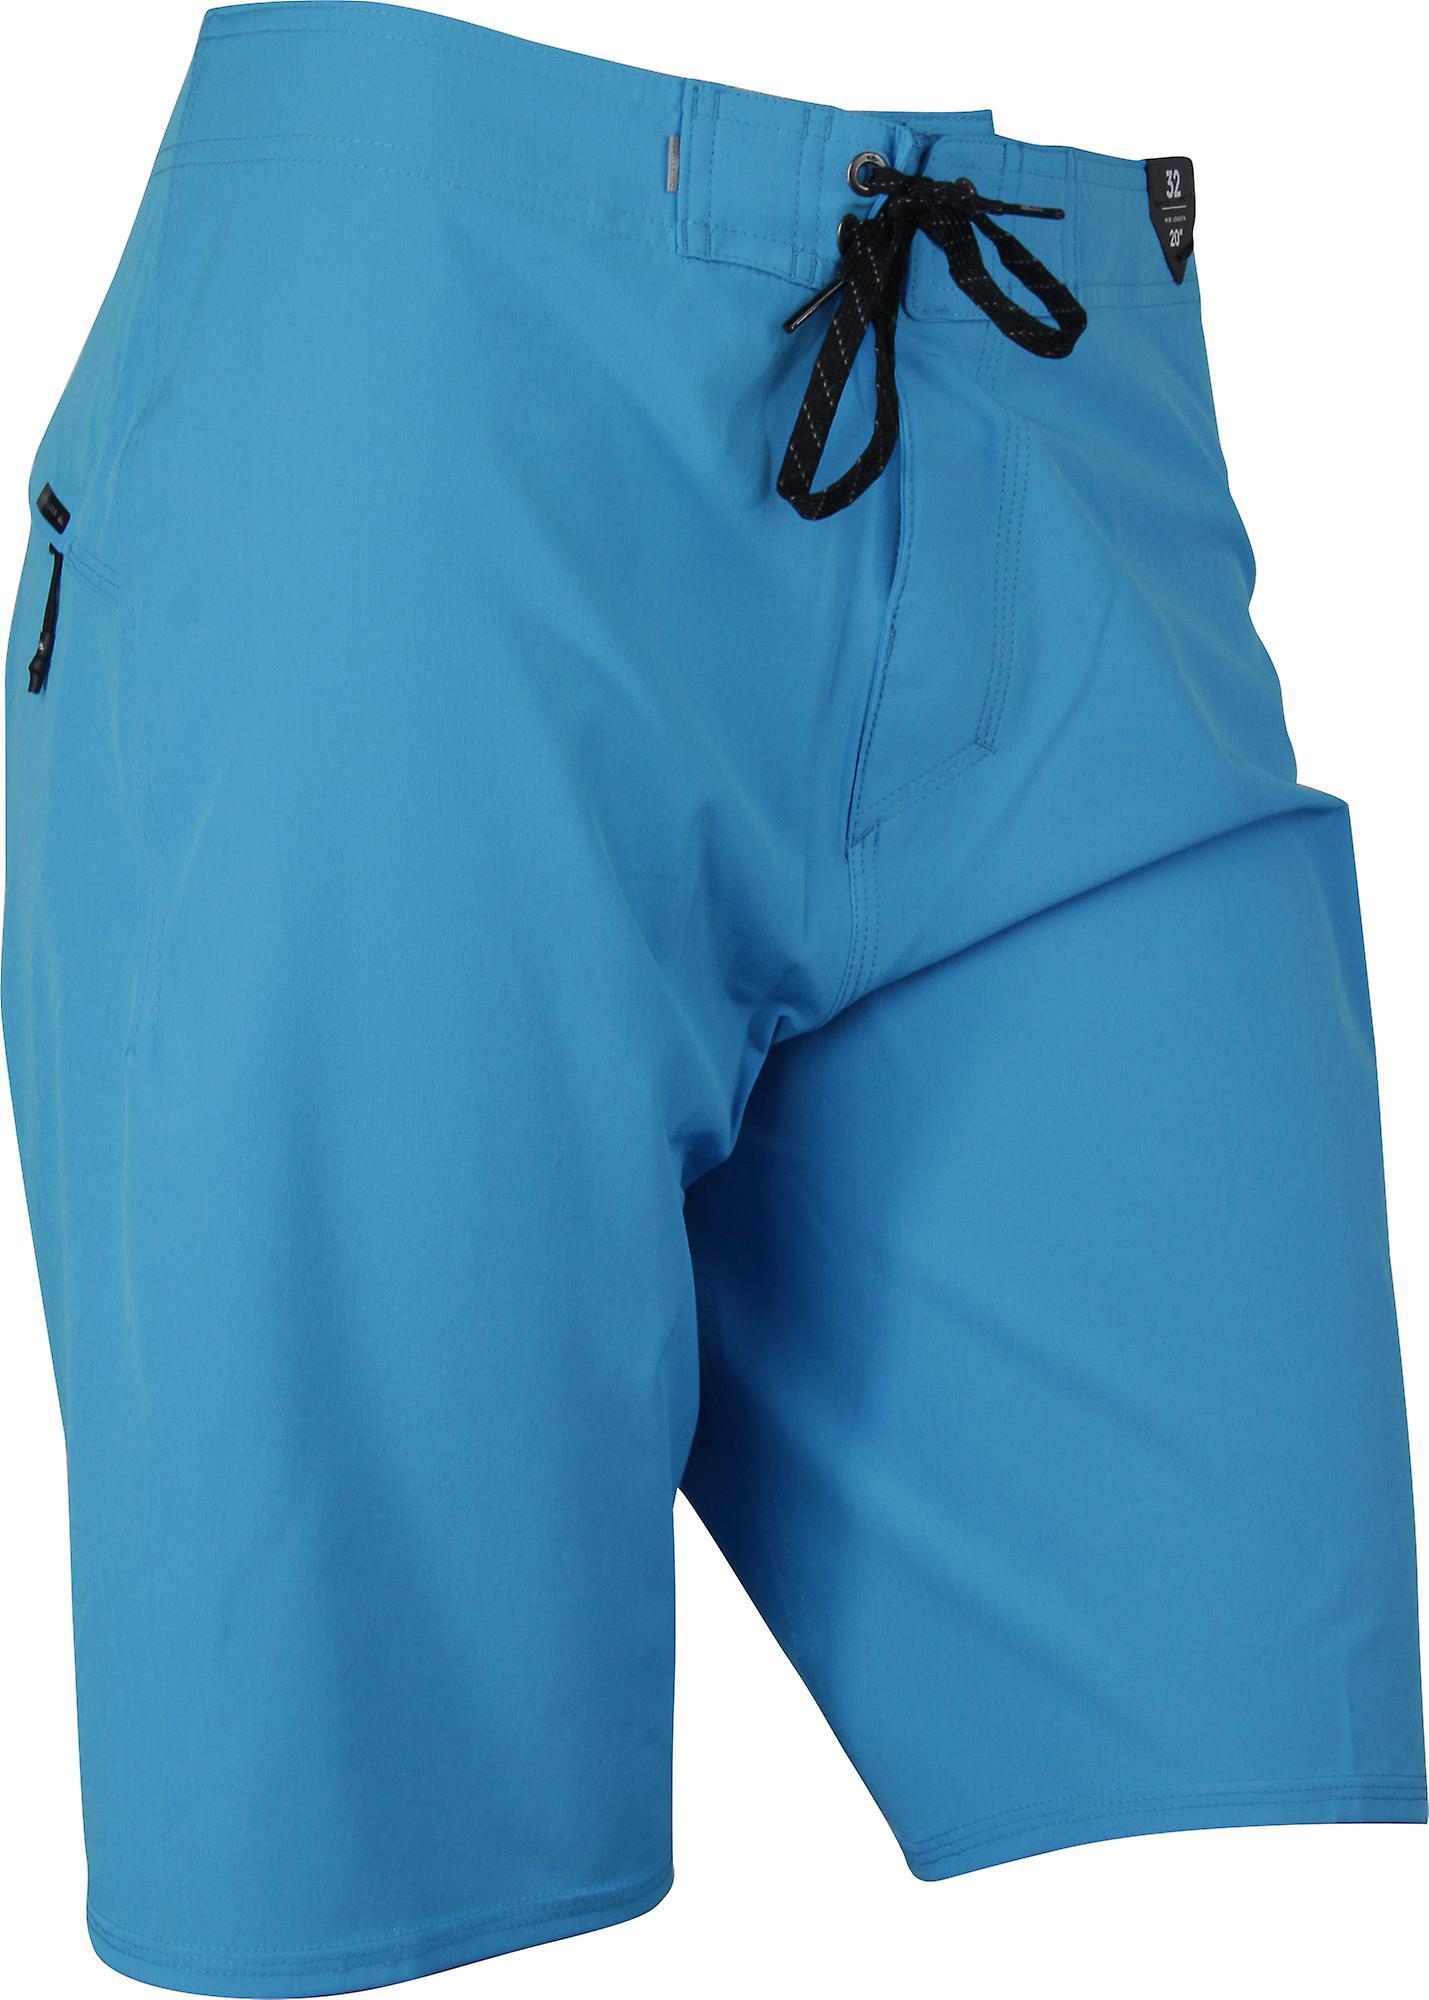 Quiksilver Mens Highline Kaimana Dryflight 20-lang Boardshorts - Malibu blå